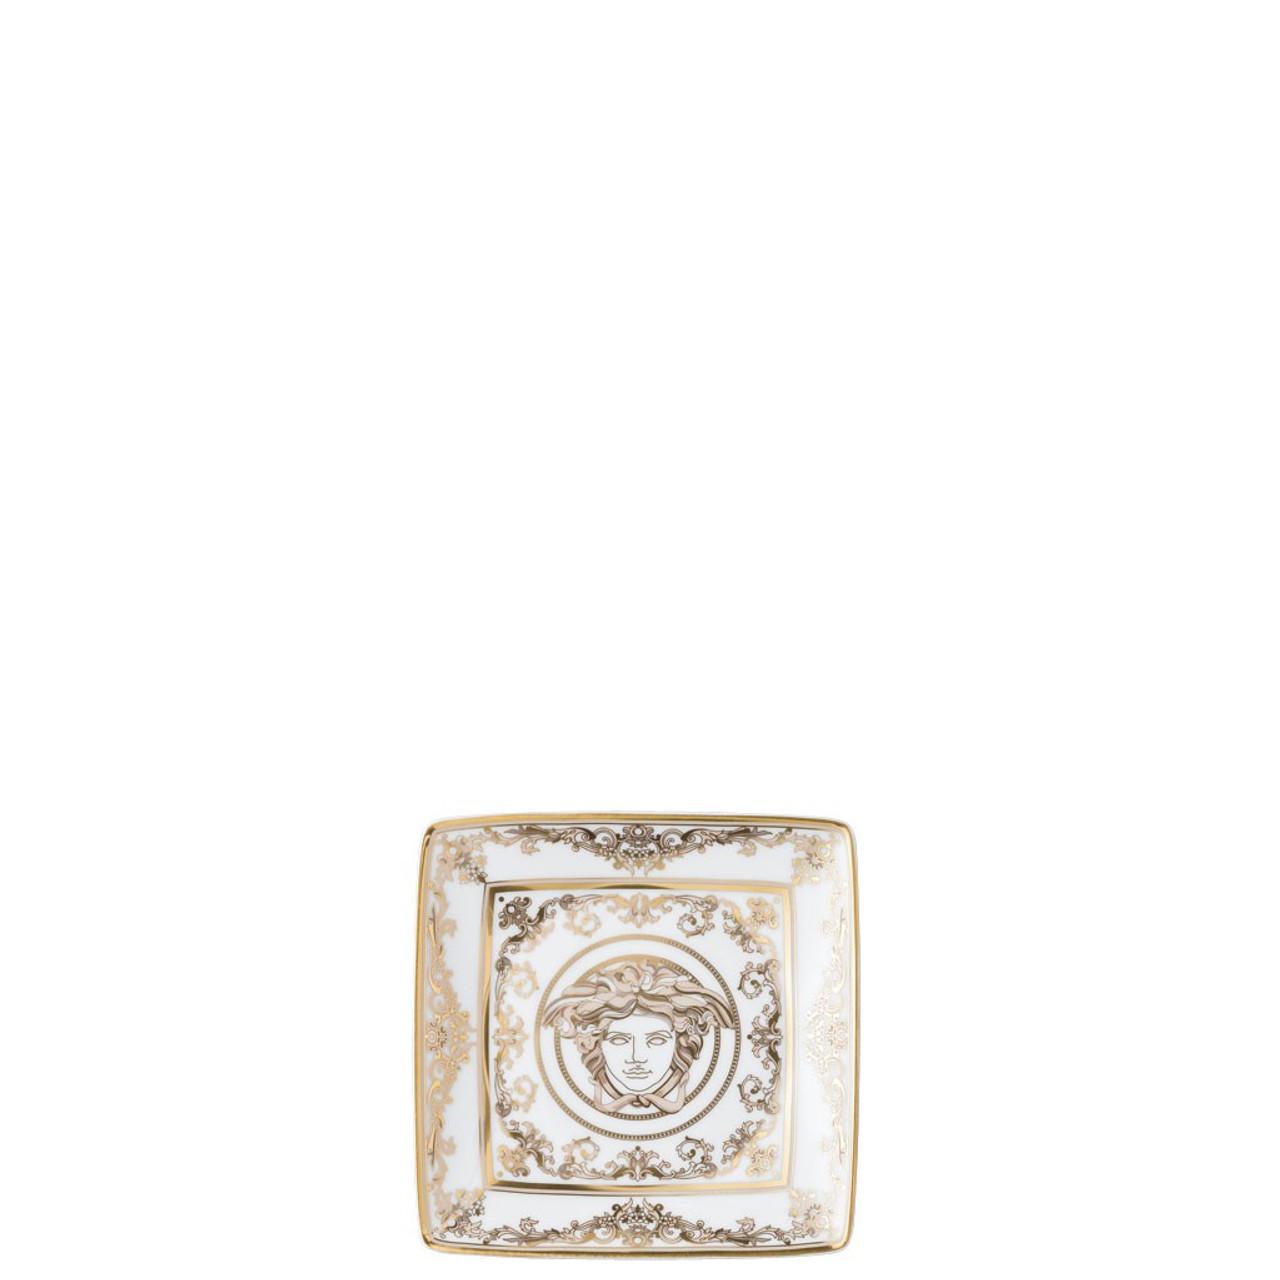 Canape dish square 4 3 4 inch medusa gala rosenthal shop - Canape versace ...